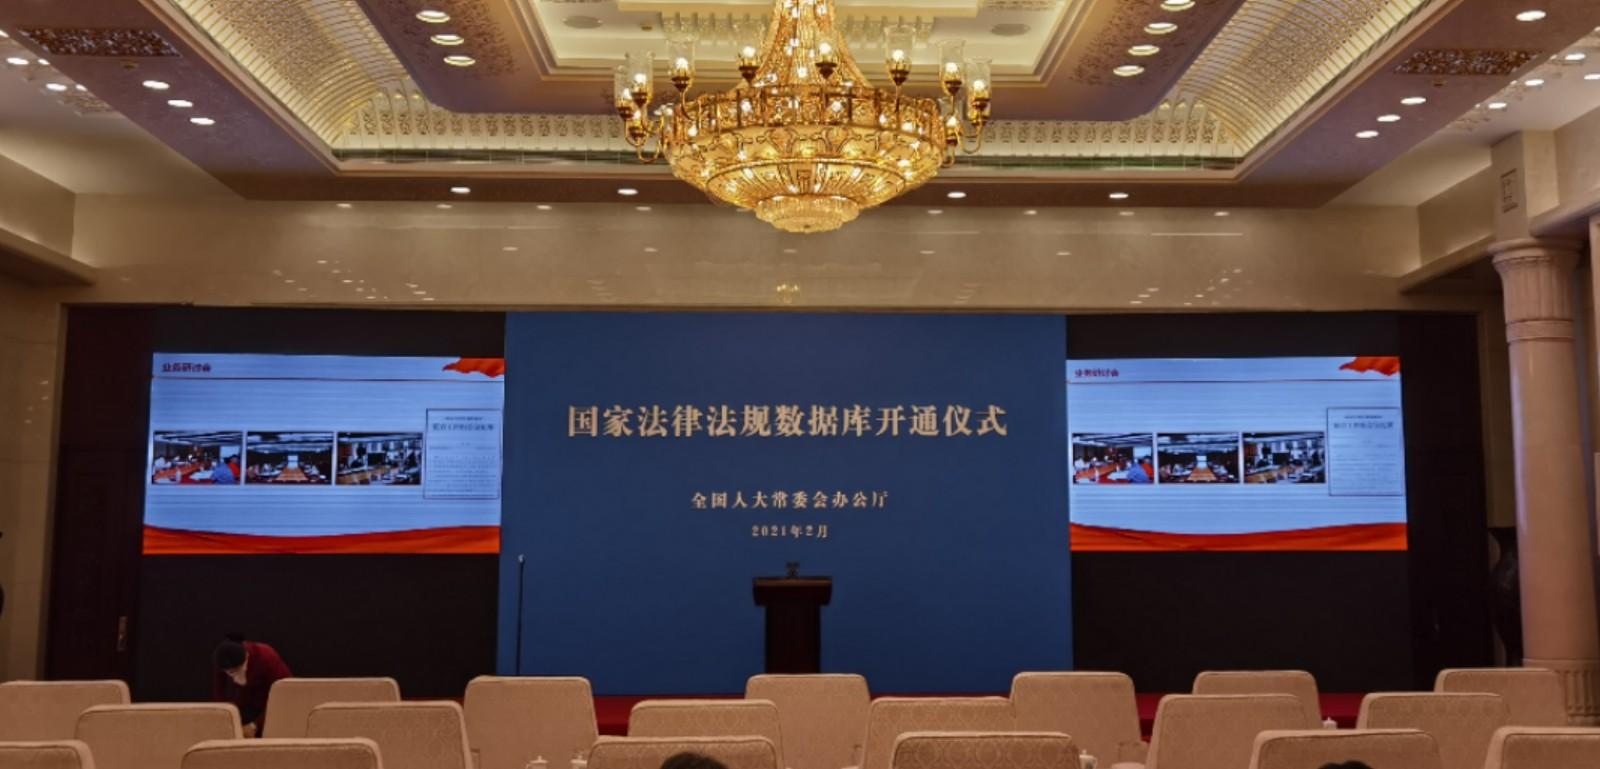 http://www.reviewcode.cn/rengongzhinen/193311.html